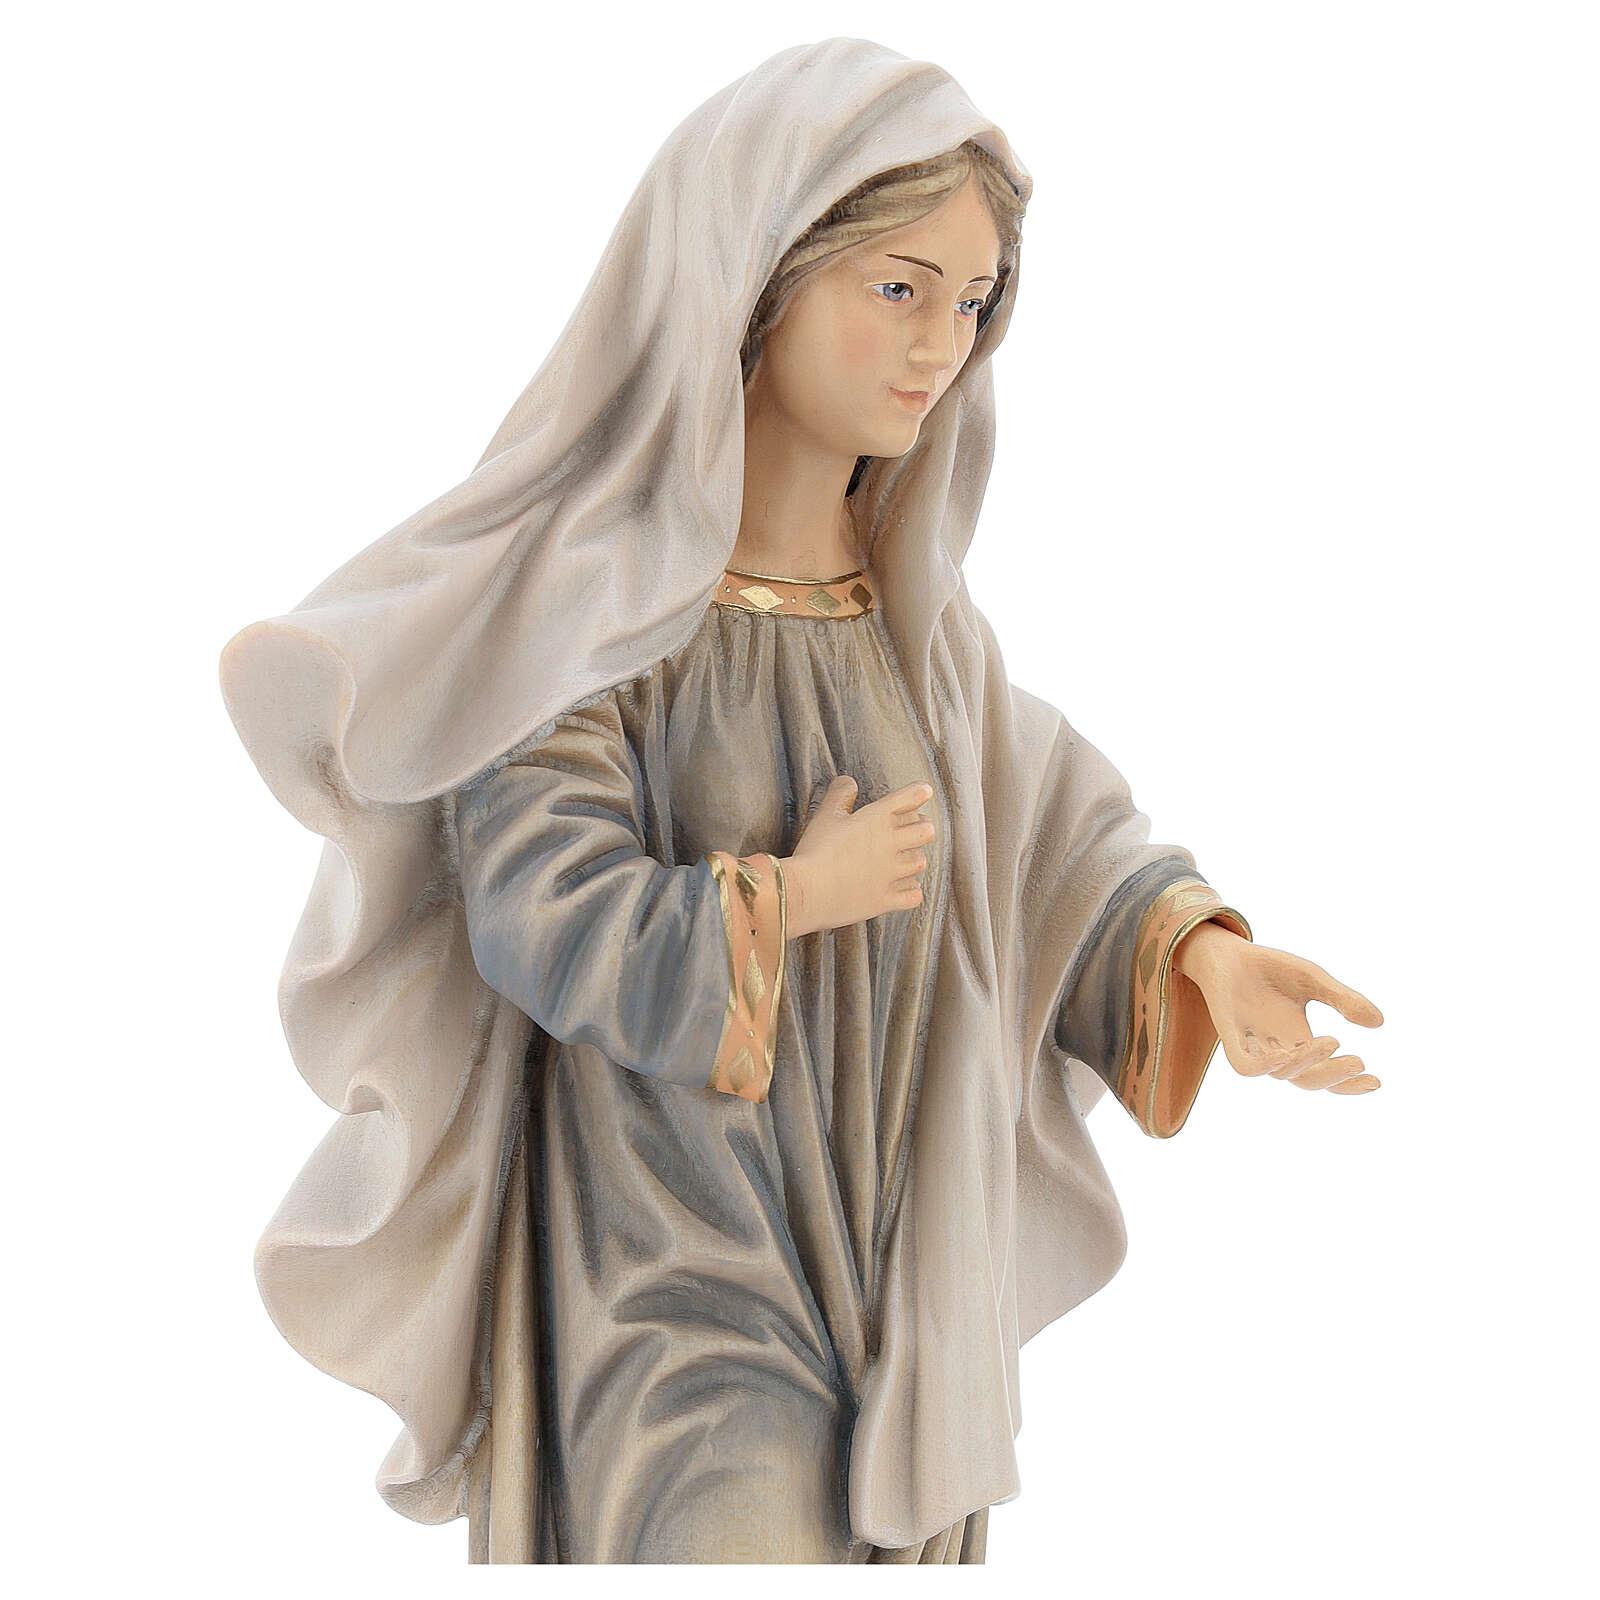 Statue Kraljica Mira avec église bois peint Val Gardena 4